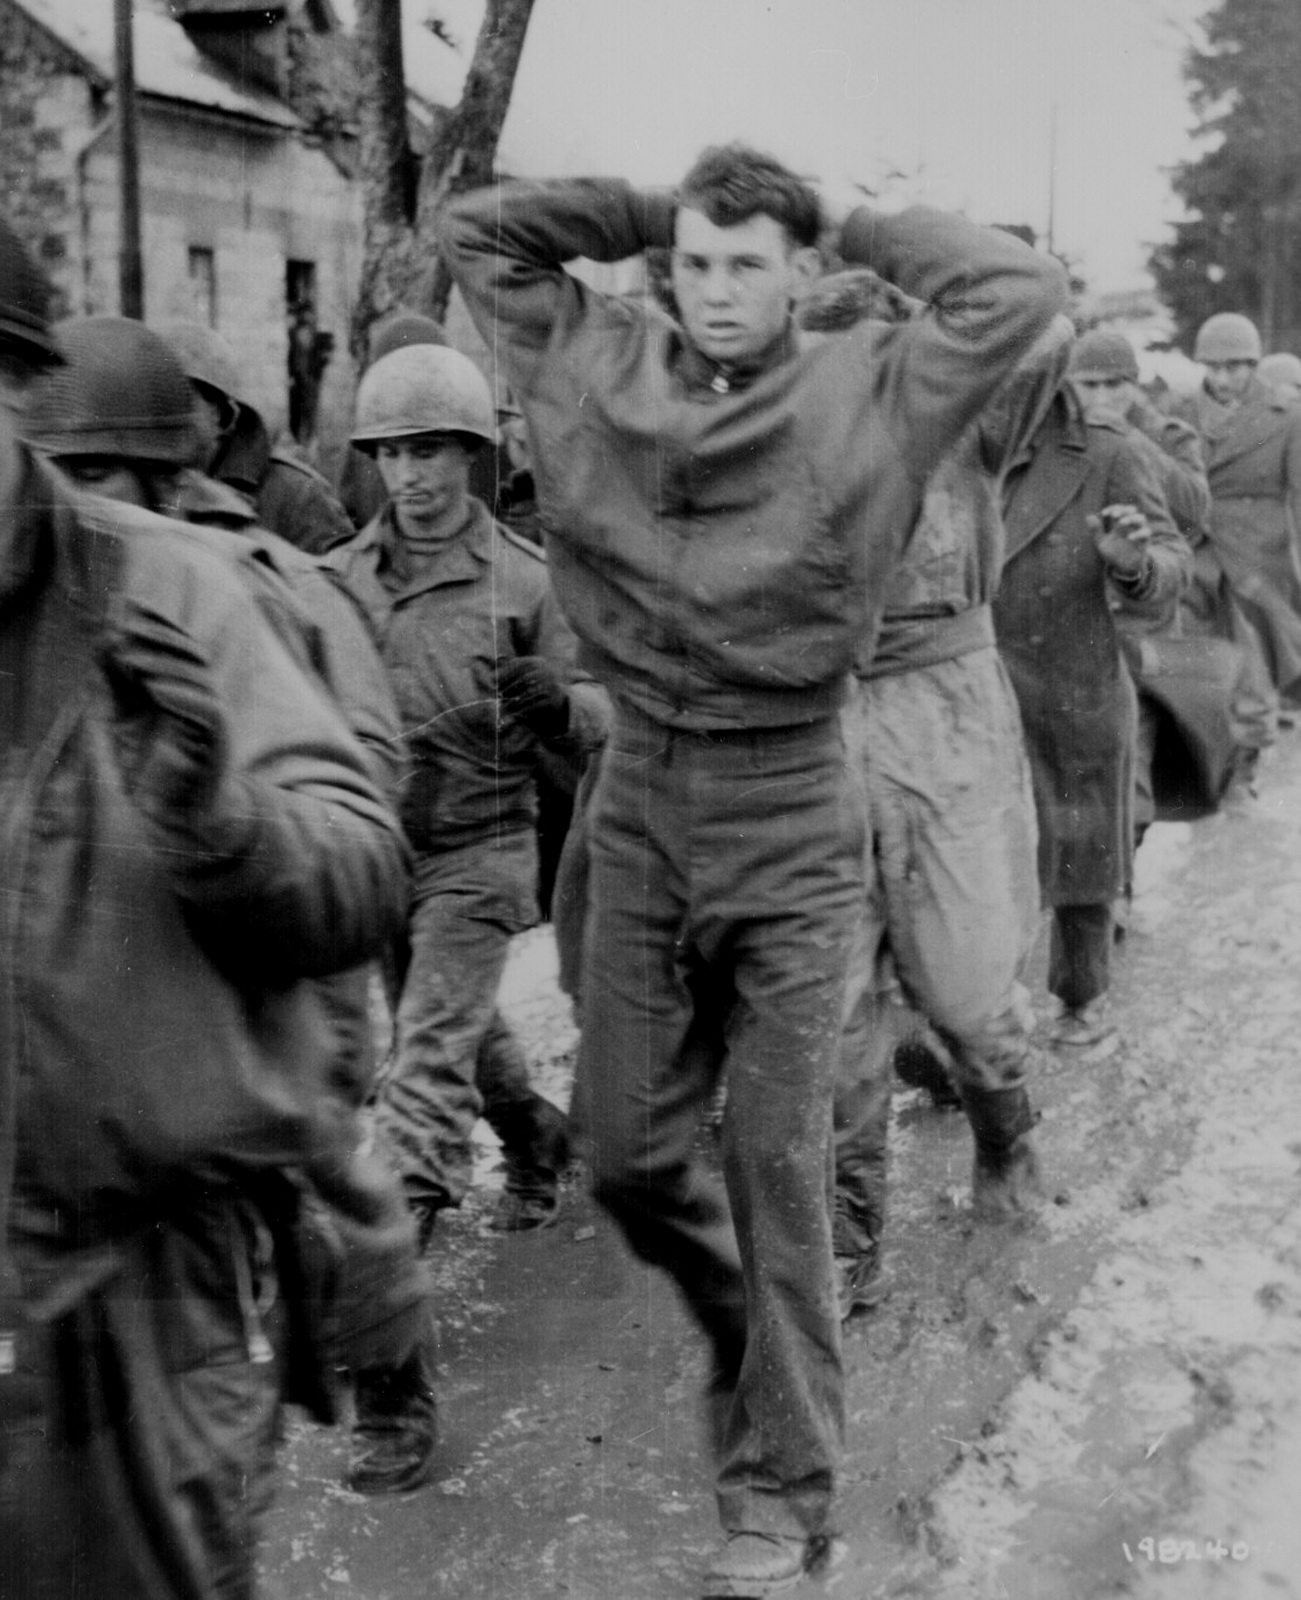 World War II Pictures In Details: November 2012